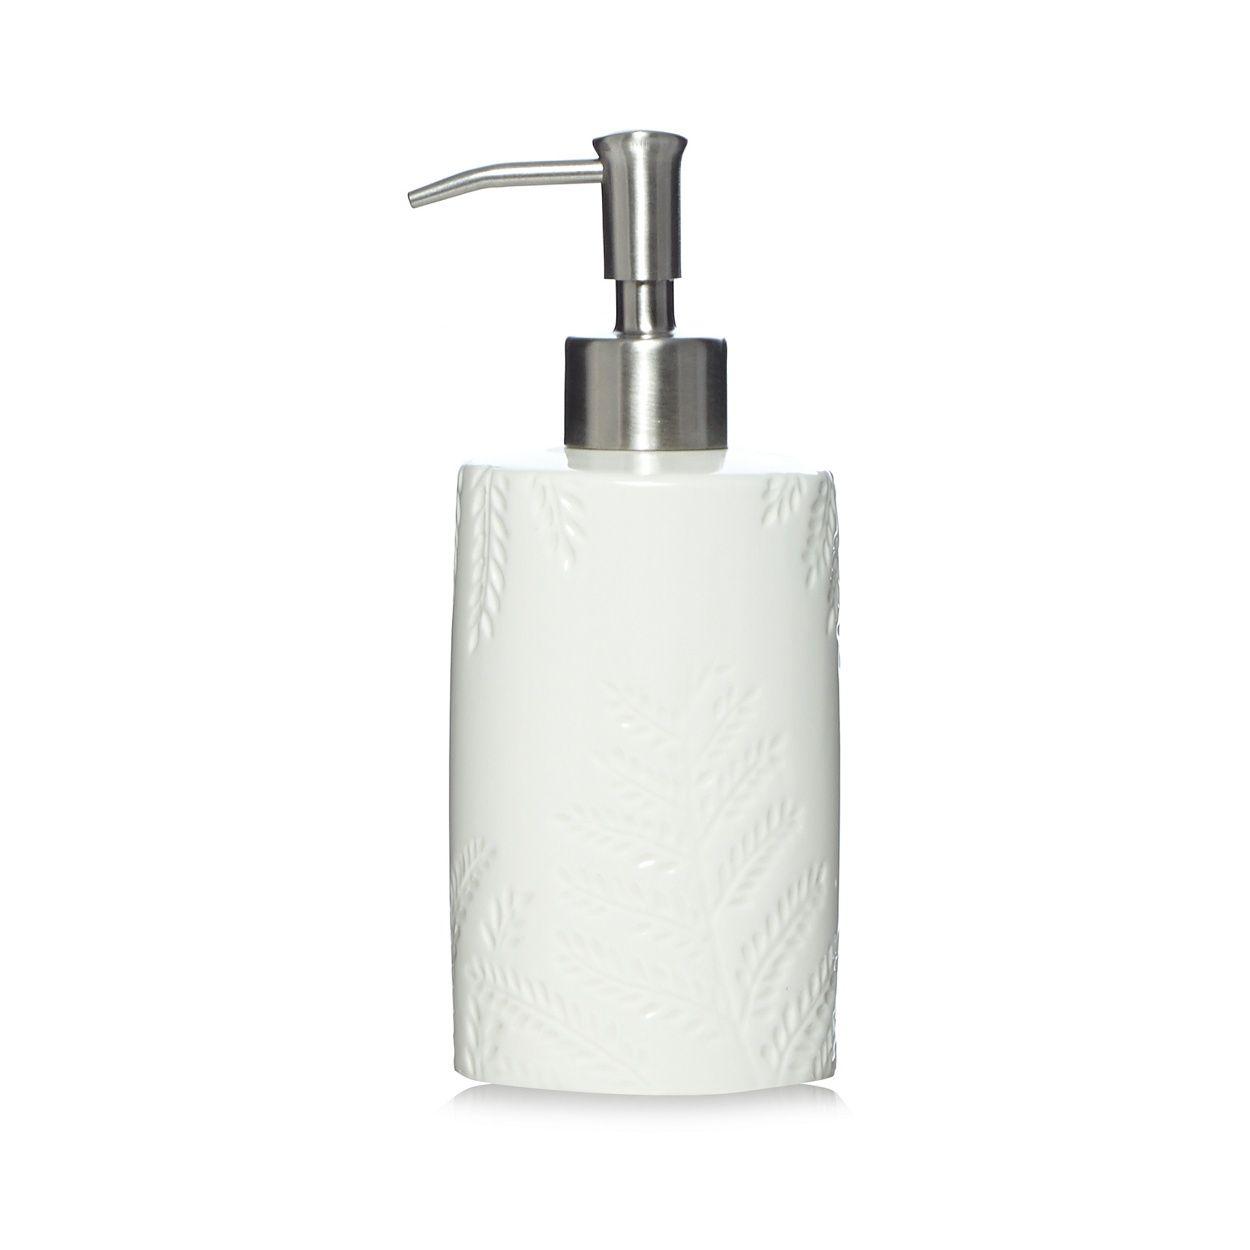 Home Collection White fern embossed soap dispenser- at Debenhams.com ...